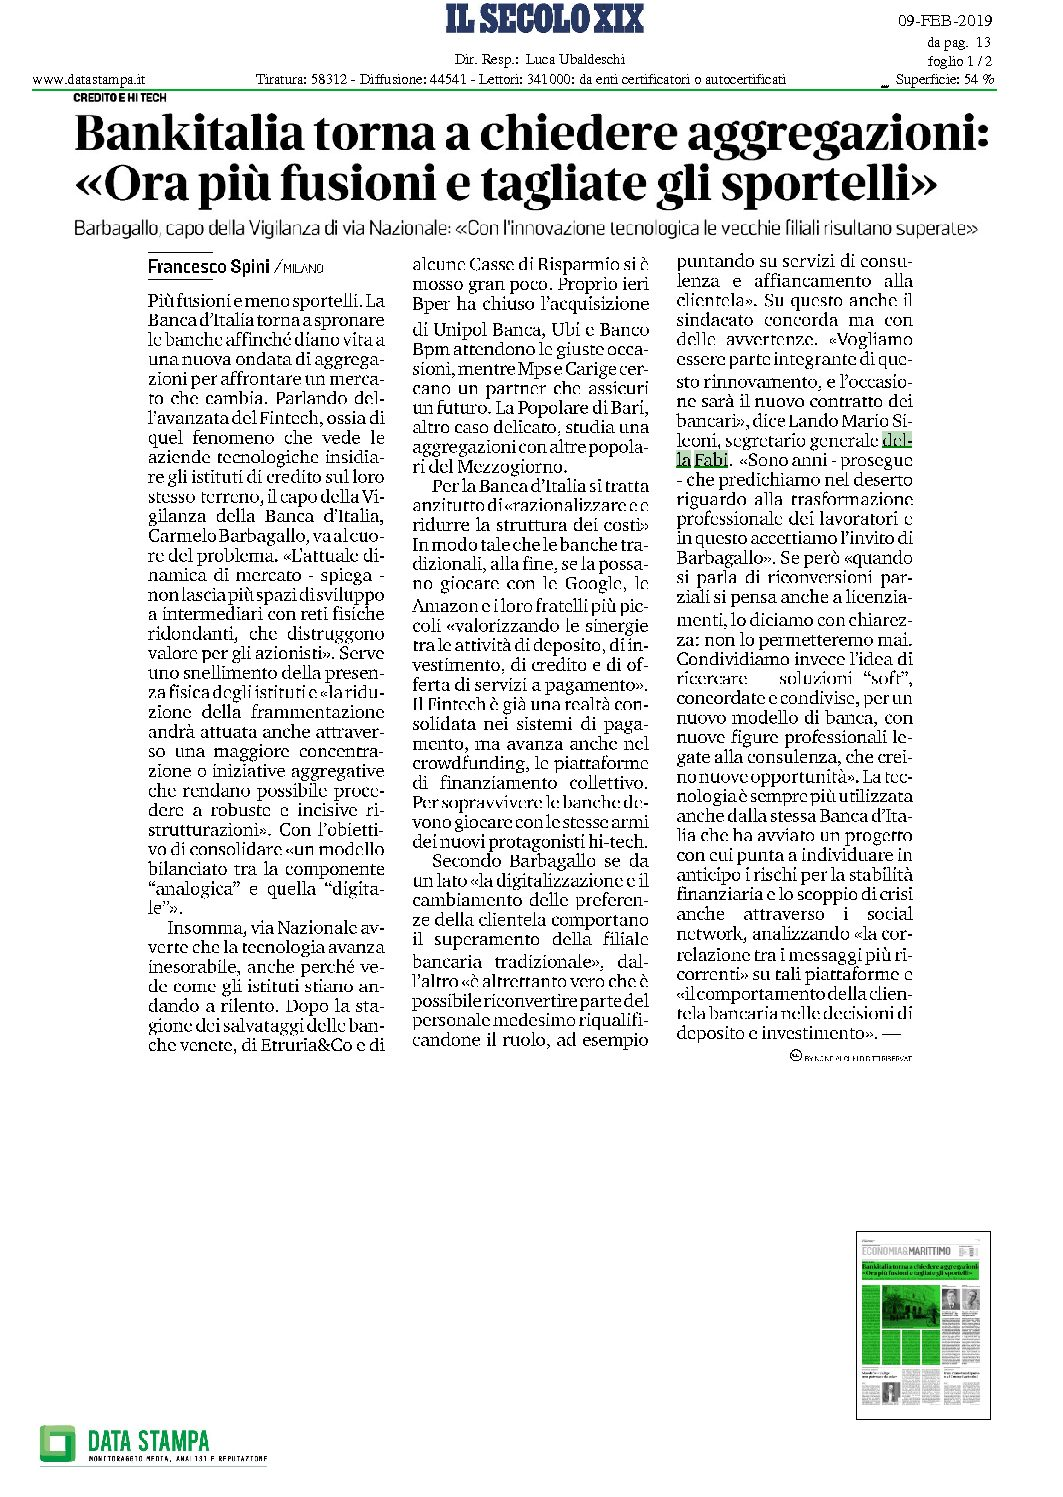 SECOLOXIX_090219_PDF